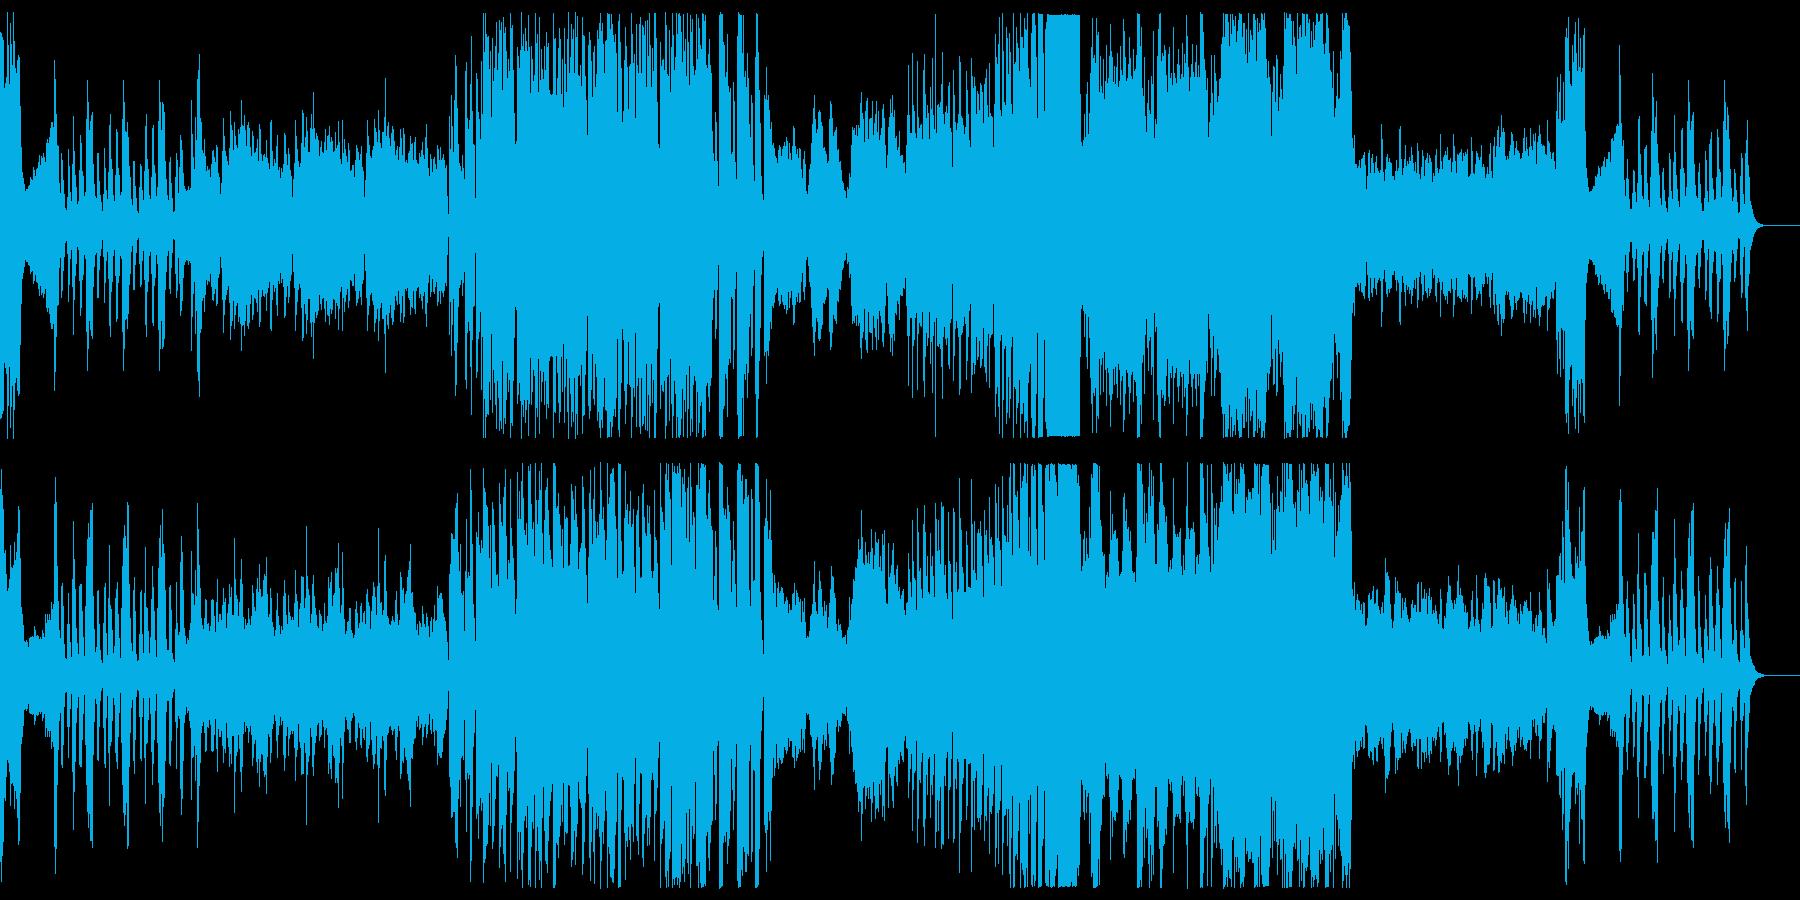 RPG 通常戦闘曲の再生済みの波形